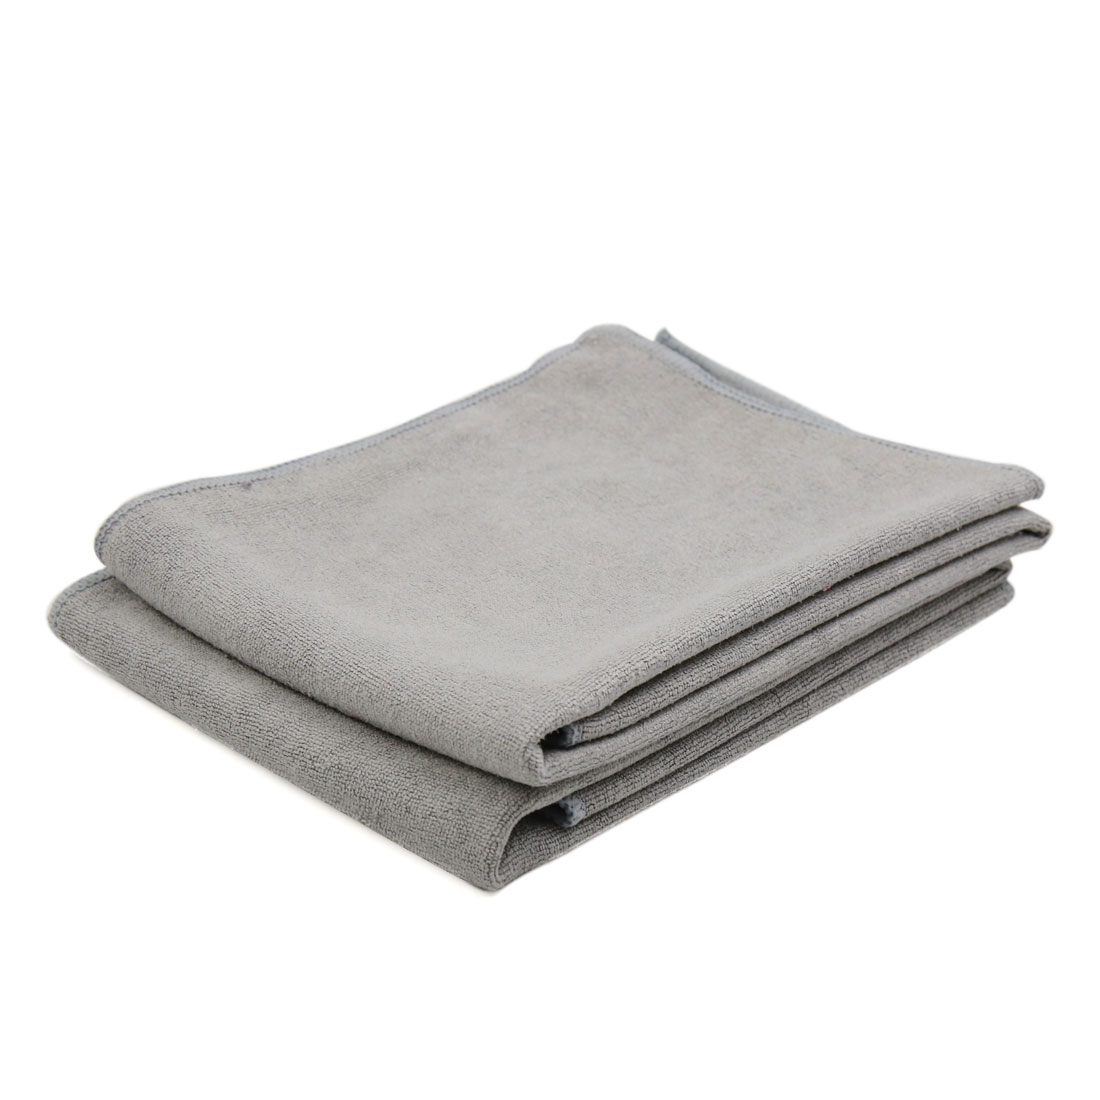 2pcs 60cm x 30cm Soft Microfiber Home Car Detailing Towel Cleaning Cloth Gray